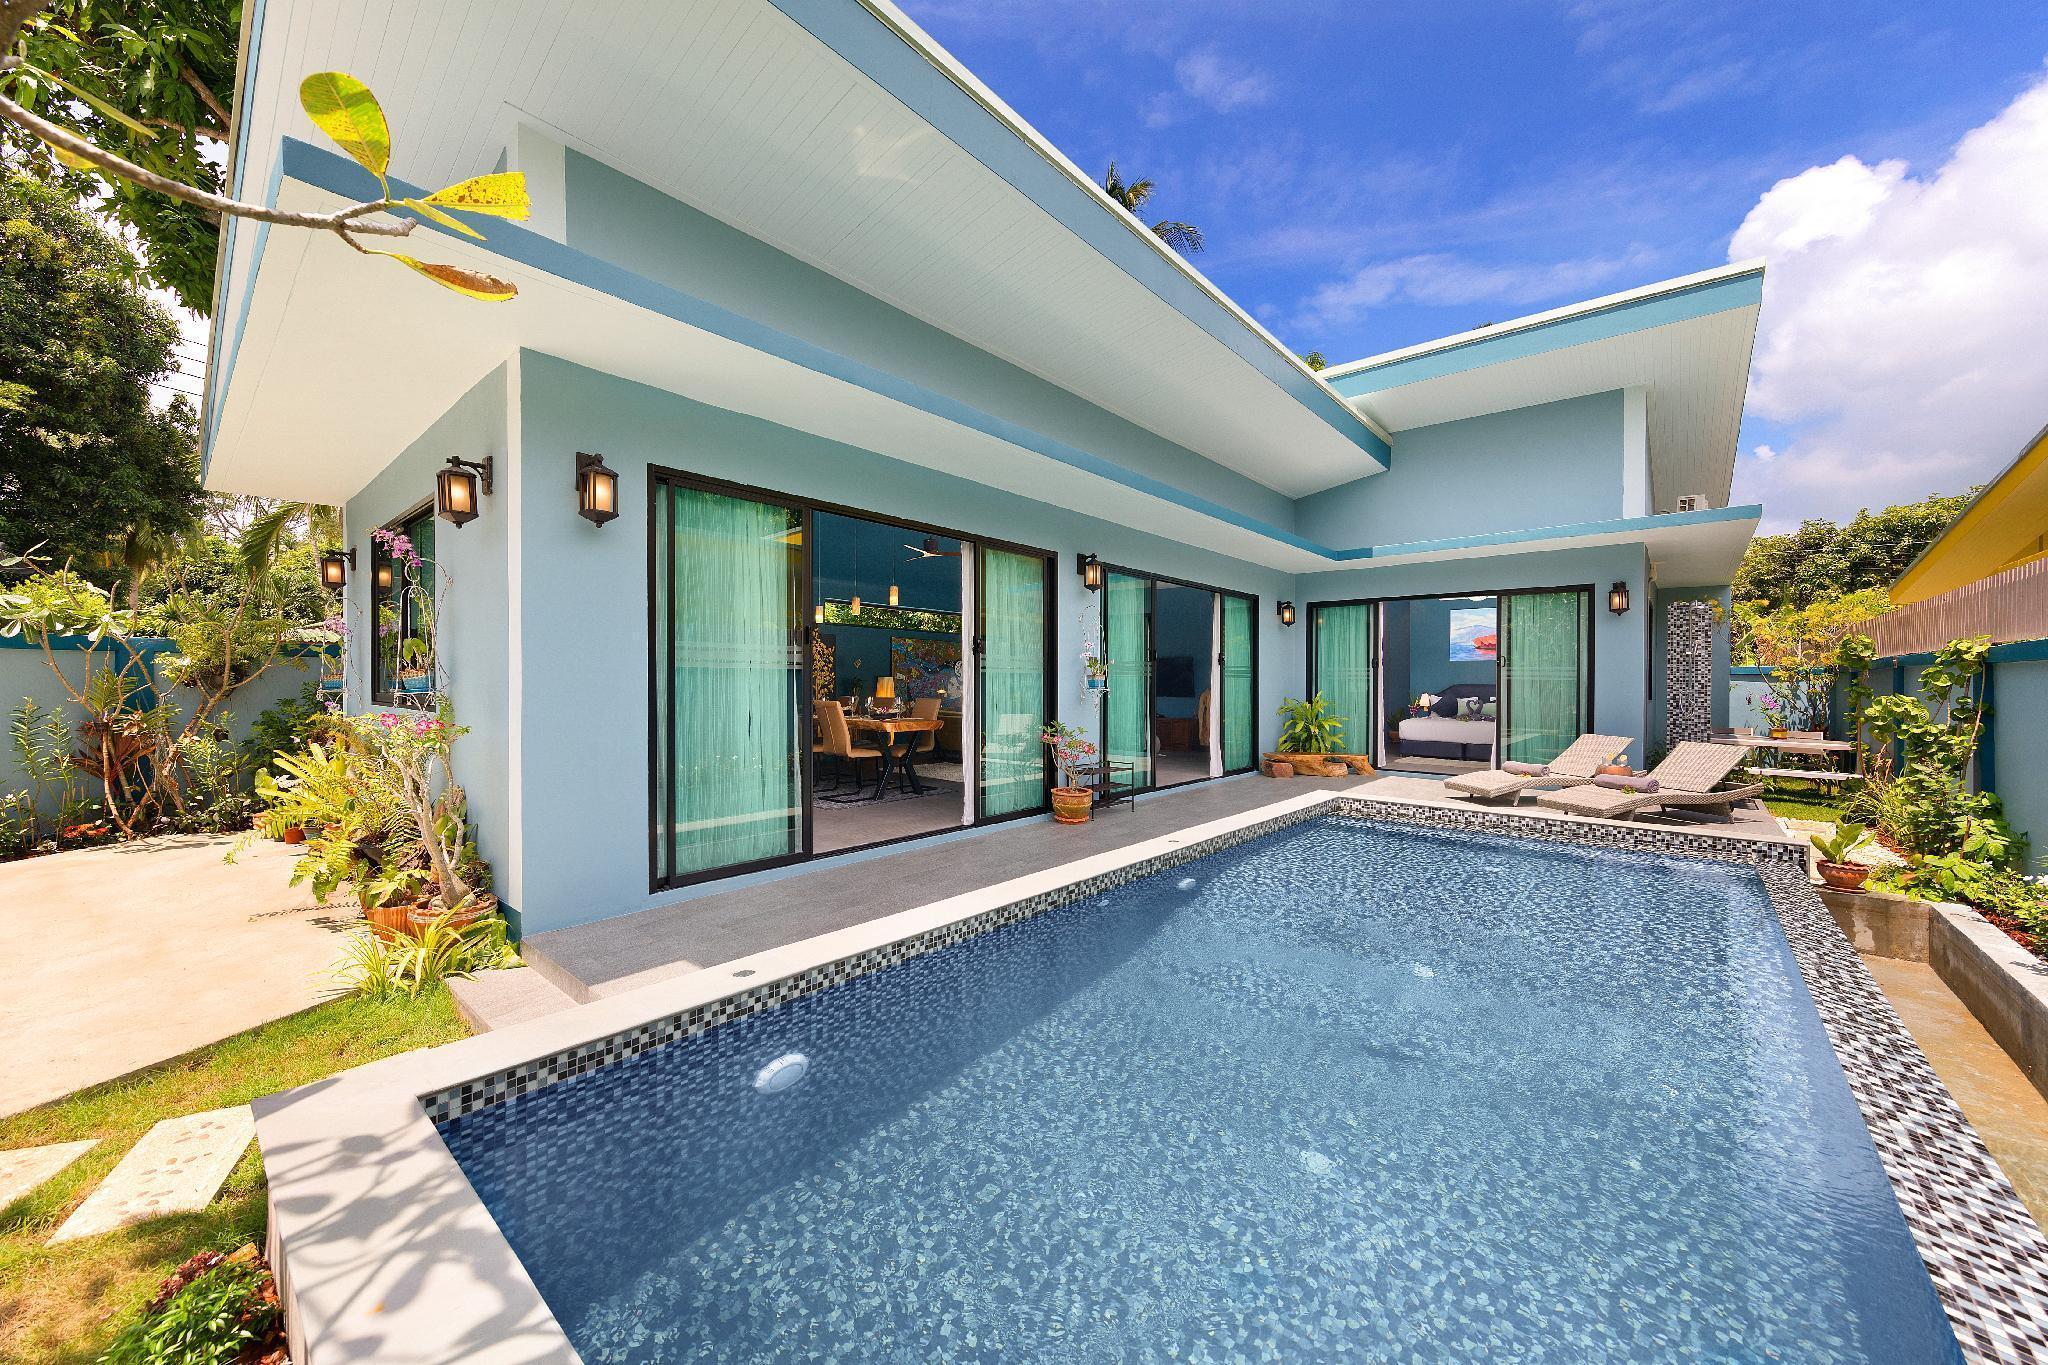 South Samui Haven.Baan KluayMai with private pool. วิลลา 3 ห้องนอน 3 ห้องน้ำส่วนตัว ขนาด 210 ตร.ม. – หน้าเมือง